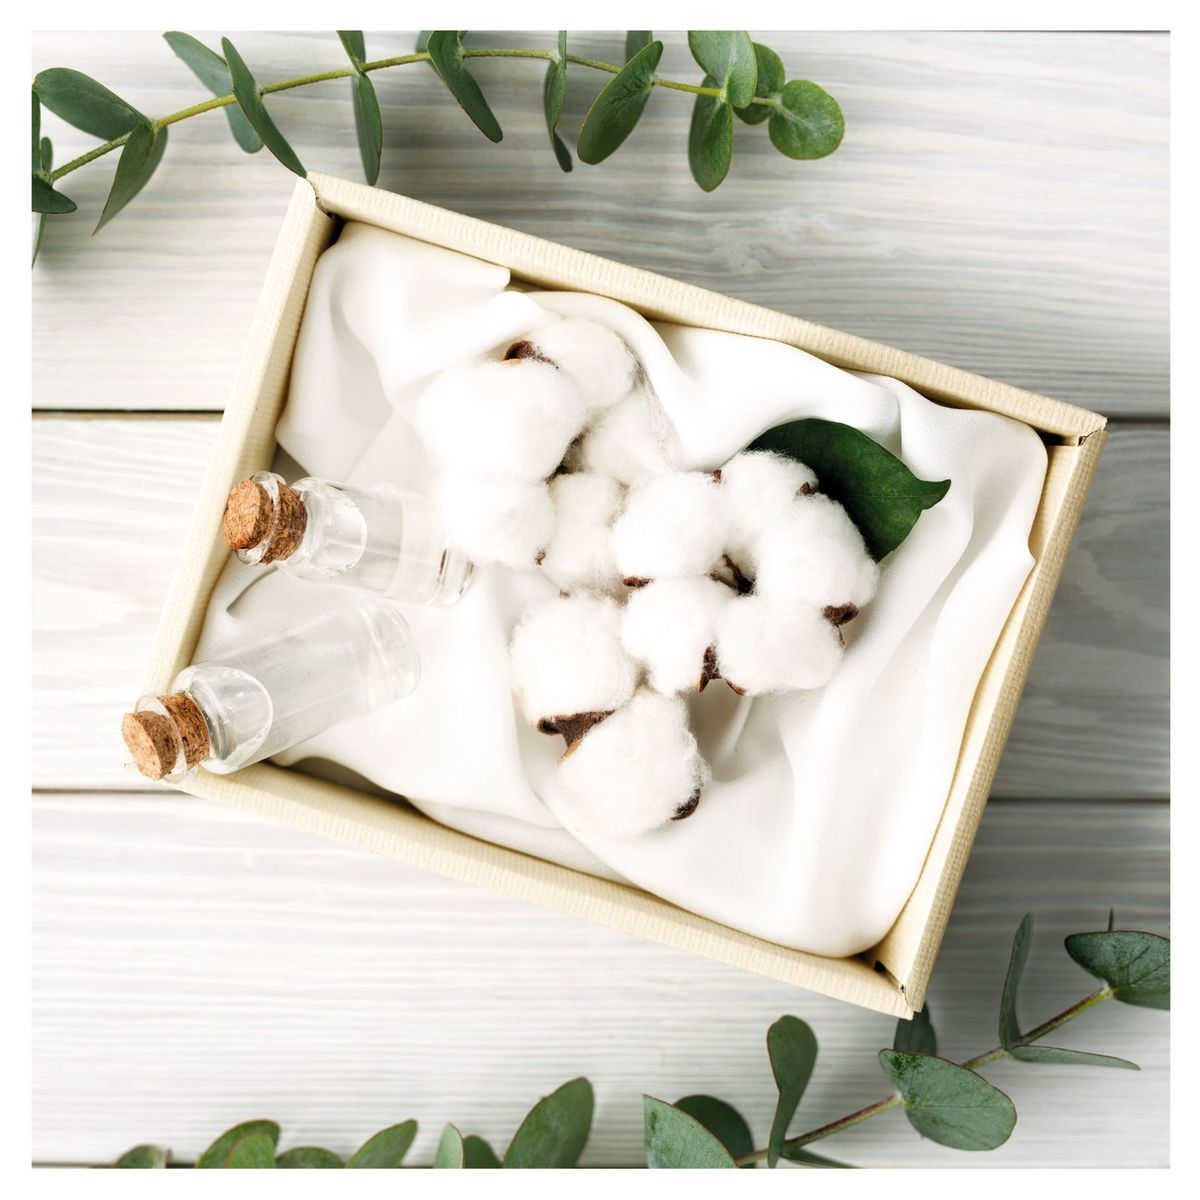 Always Cotton ProtectionNight Maat 3 Maandverband Met Vleugels 9 Stuks